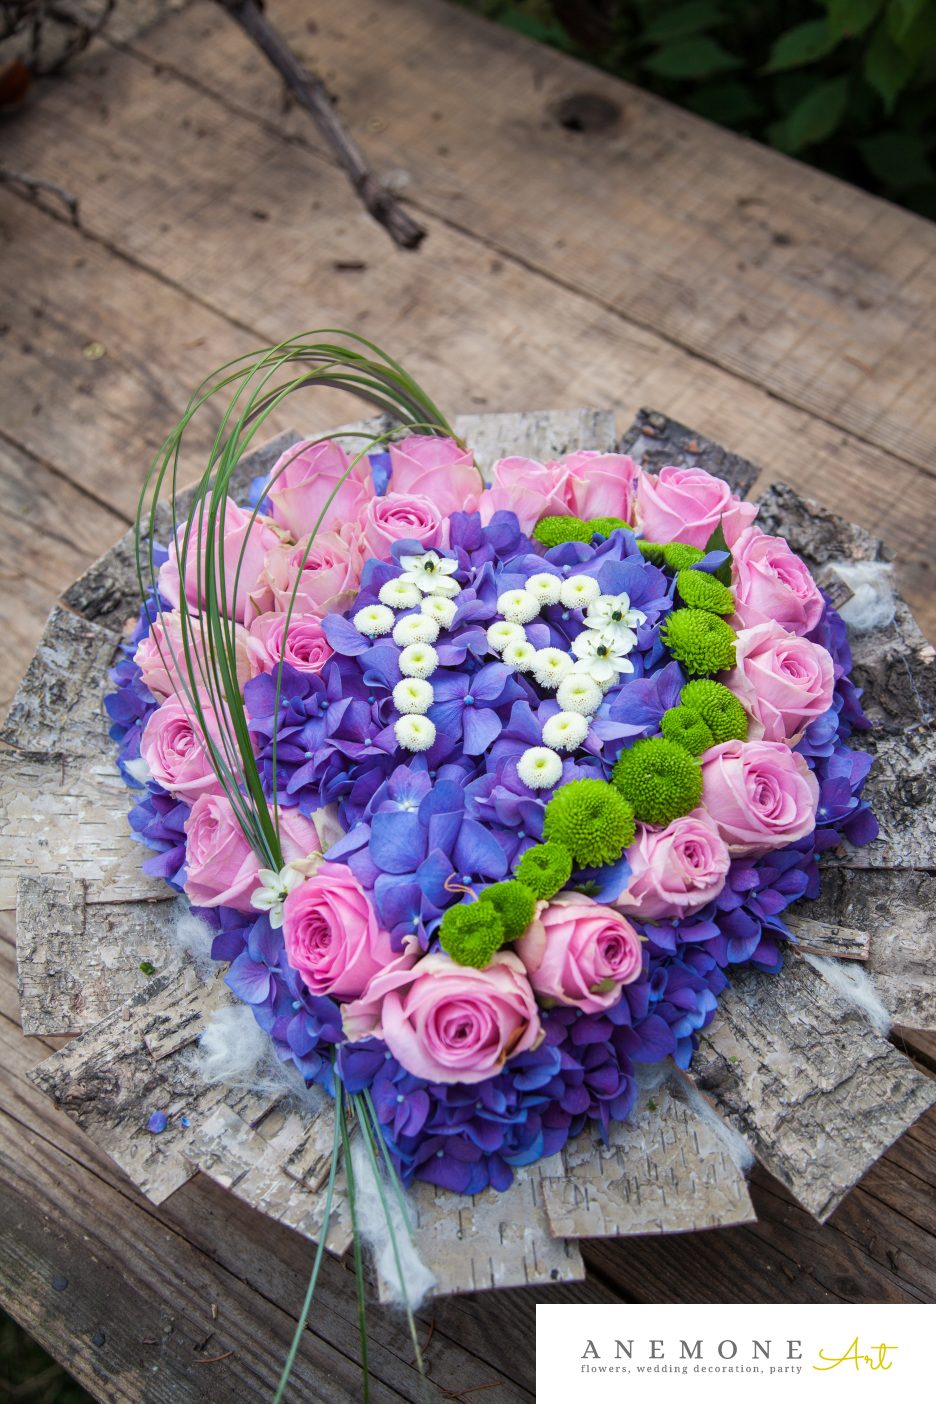 Poza, foto cu Flori de nunta aniversare, decor tematic, hortensia, inima, trandafiri in Arad, Timisoara, Oradea (wedding flowers, bouquets) nunta Arad, Timisoara, Oradea